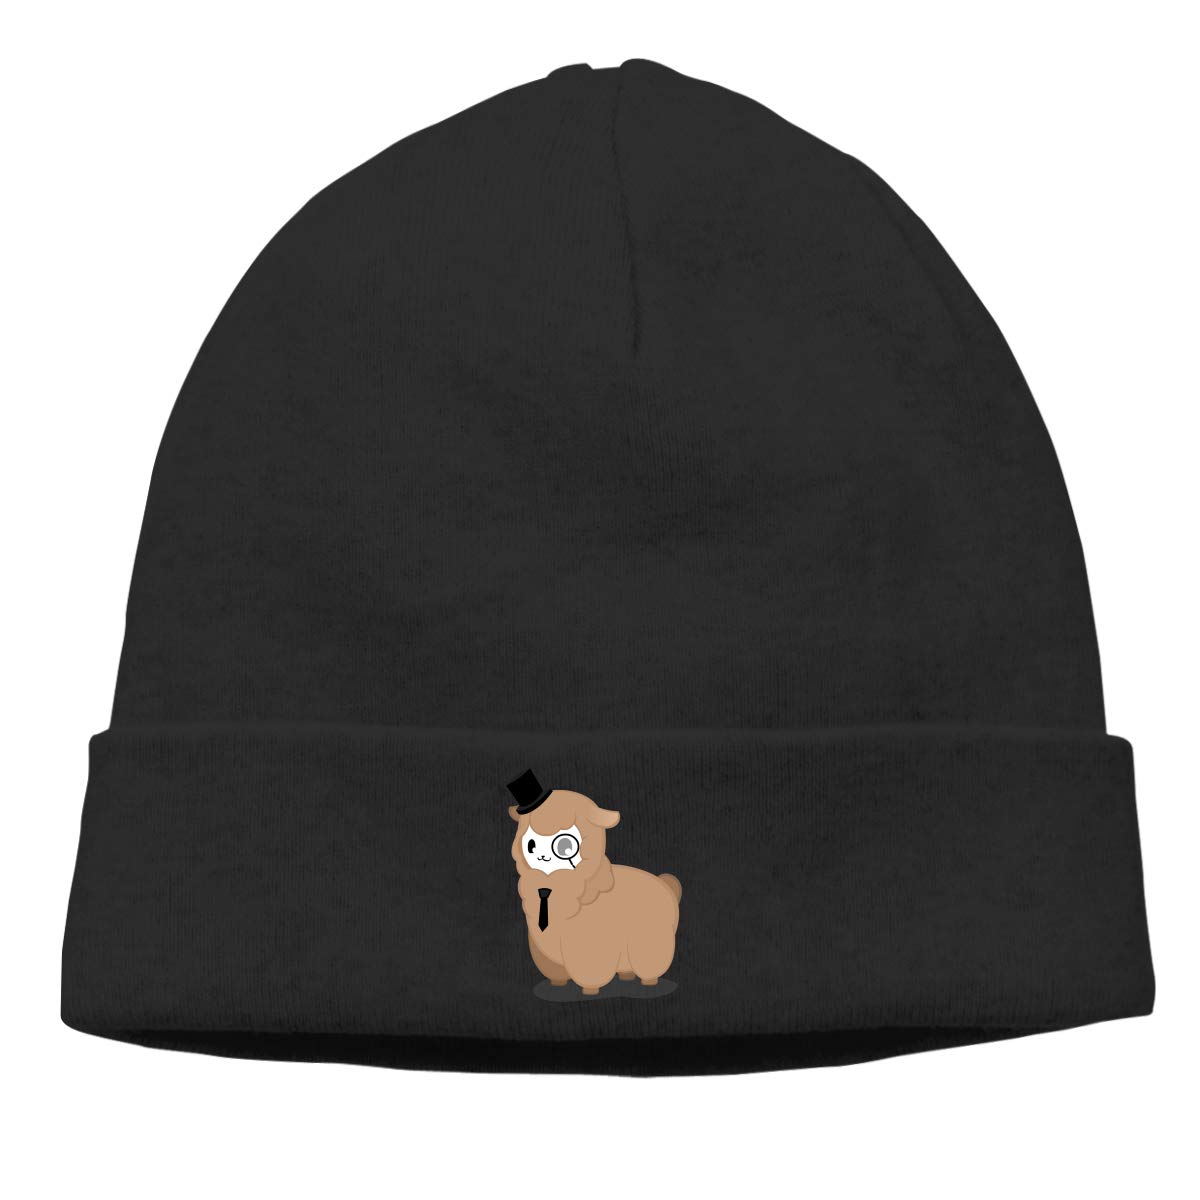 d344cf8d04588 Amazon.com  Alpaca Detective Sheep Unisex Winter Knitting Wool Warm Hat  Daily Slouchy Hats Beanie Skull Cap Black  Clothing